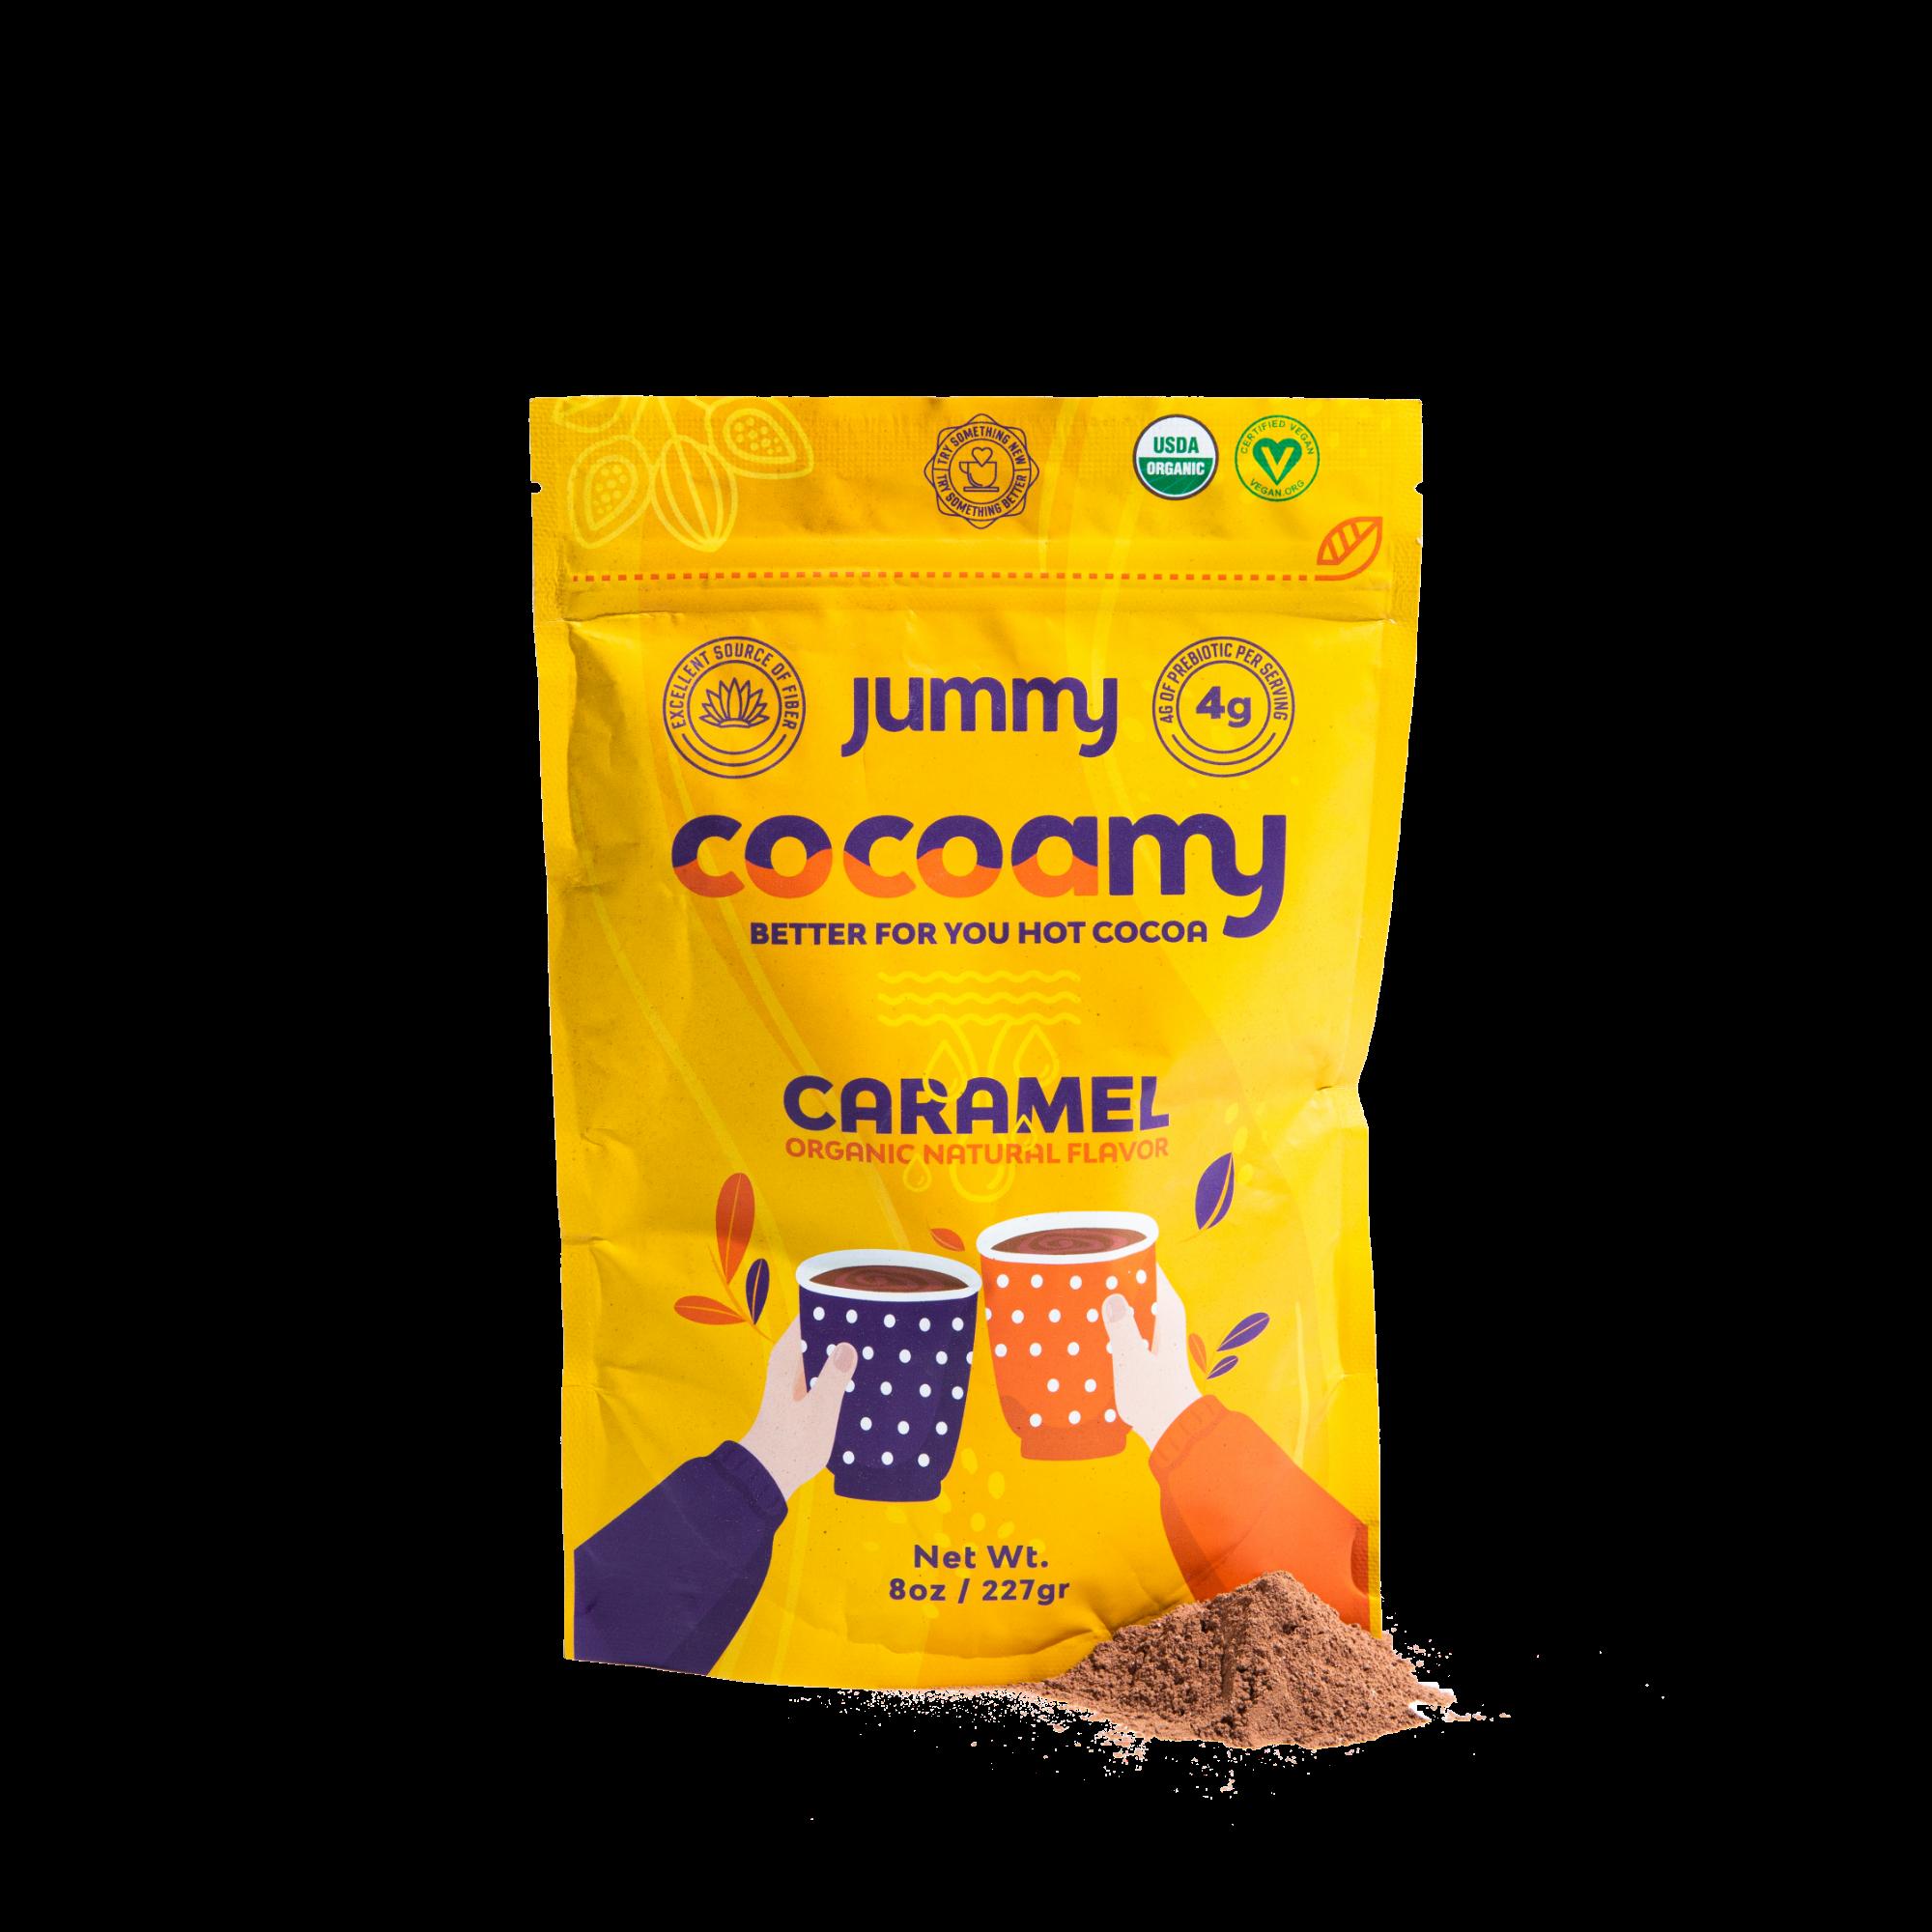 Jummy - Cocoamy Organic Hot Cocoa Caramel Flavor